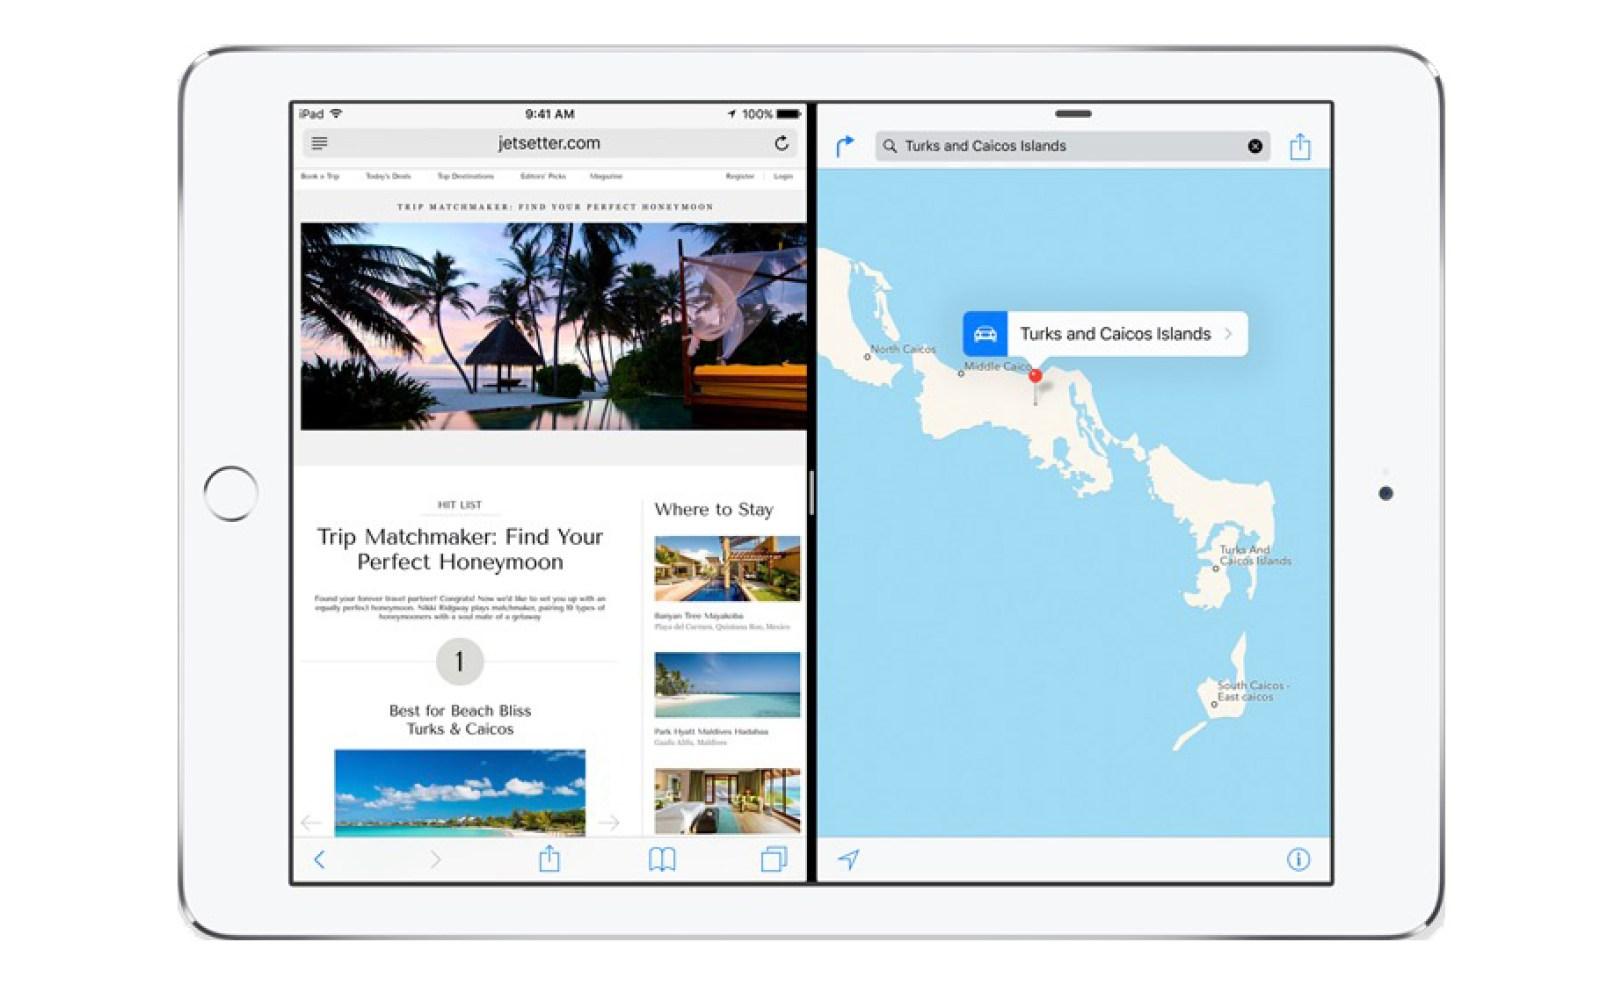 How-To: Prepare your iPhone, iPad or Mac for iOS 9 + OS X El Capitan public betas